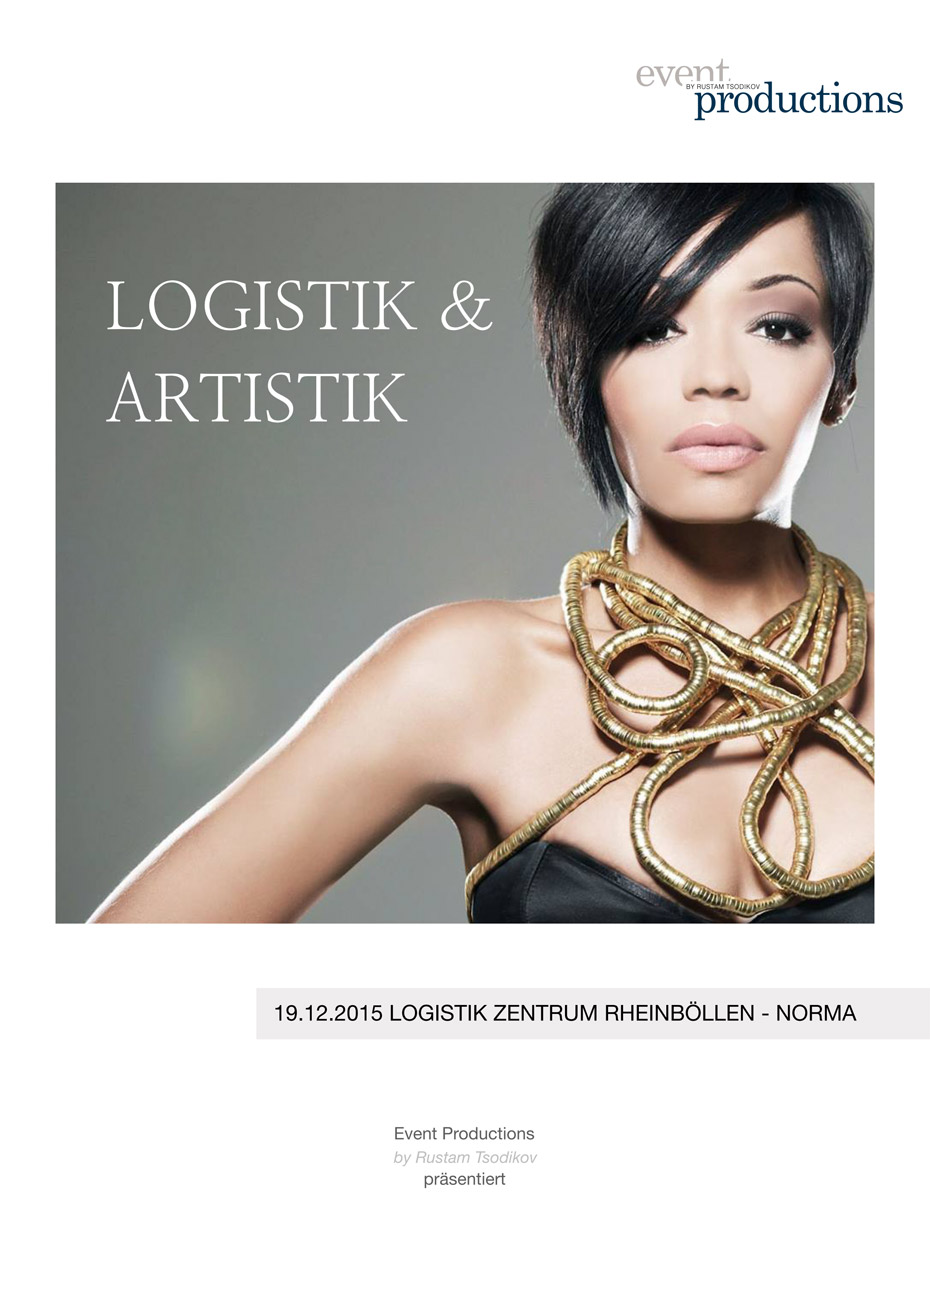 event productions by rustam tsodikov international full service logistik artistik event